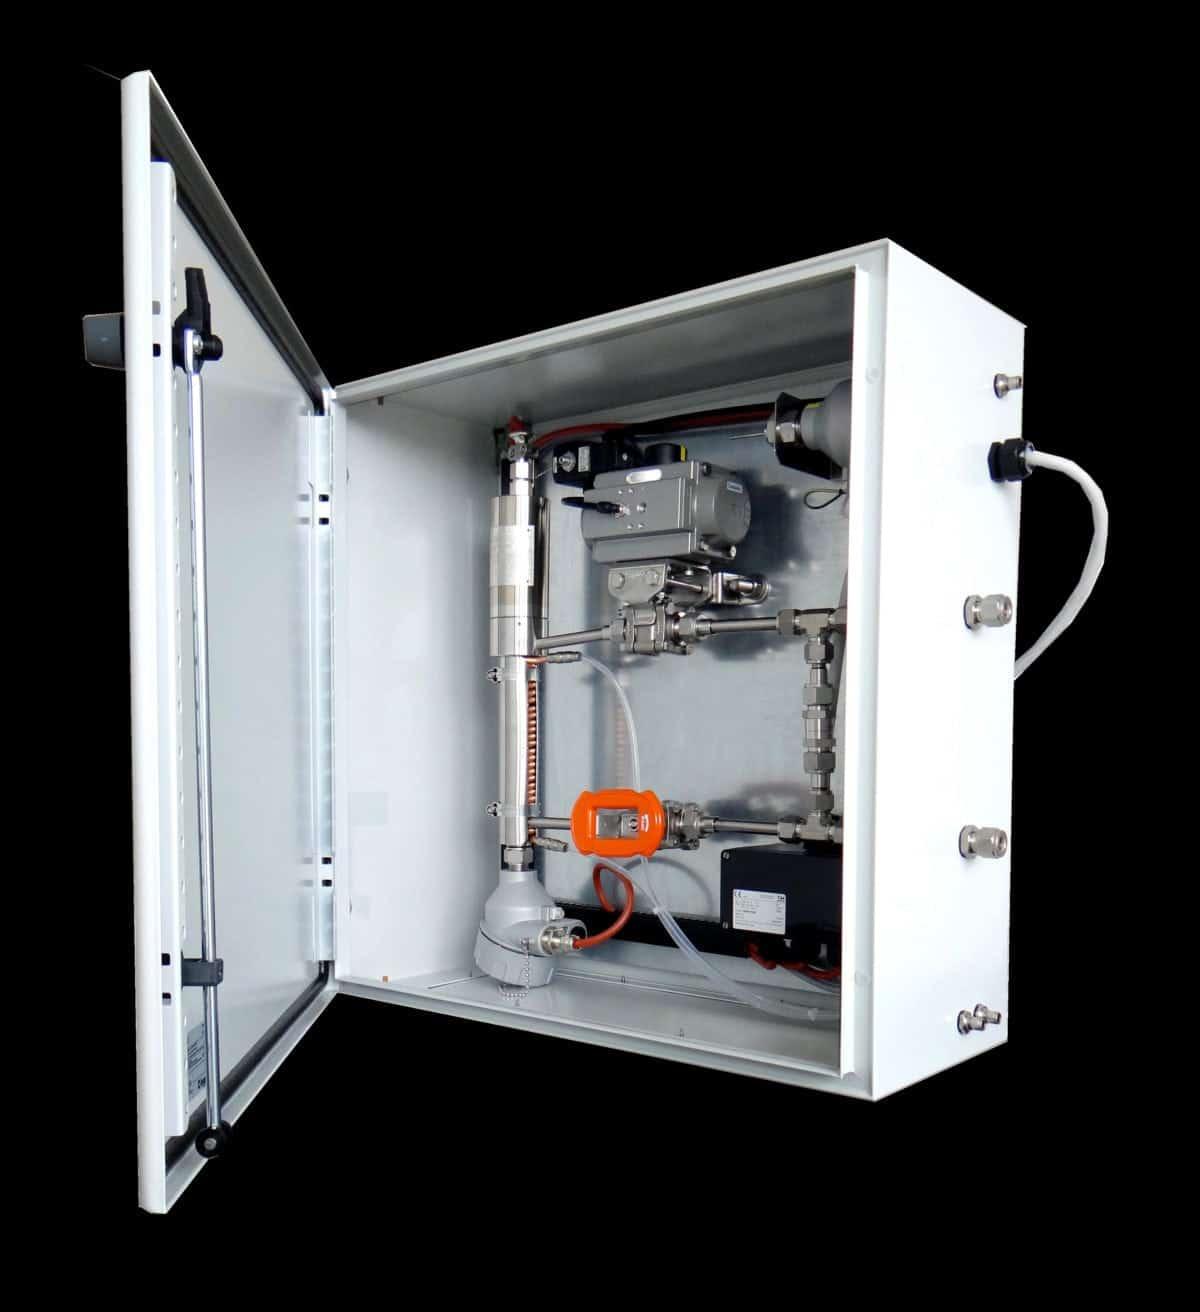 Thermoset-LT viscosity analyzer